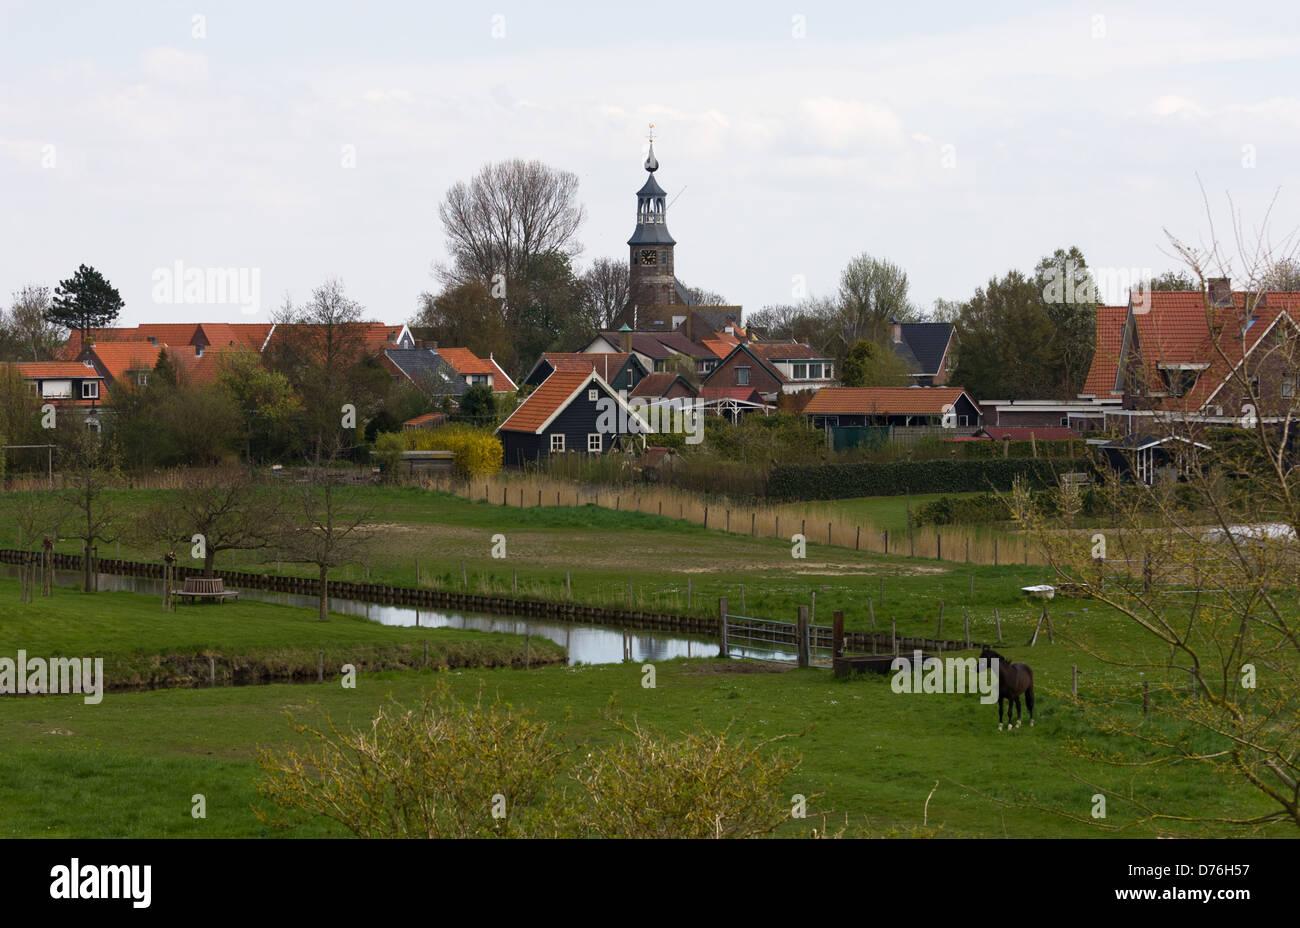 The village of Kattendijke in early spring. Zuid-Beveland. Zeeland, Netherlands. - Stock Image